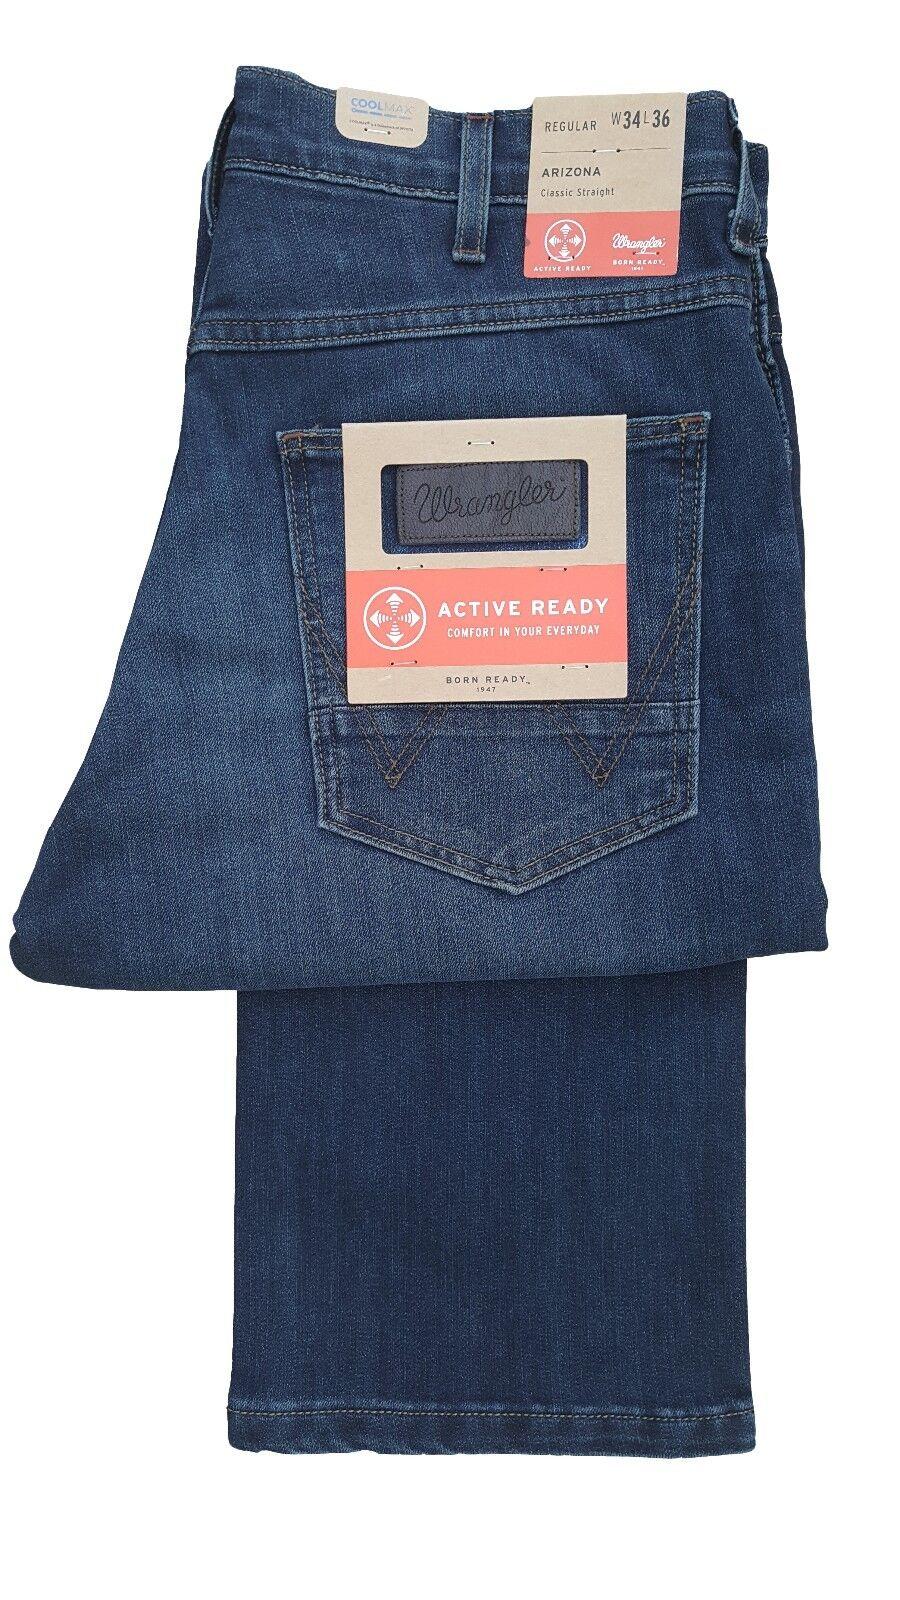 f01dd886 Mens Tall 36 Leg X-Long Regular Fit Fashion Jean - bluee Faded Arizona  Wrangler nfhxiy5126-Jeans